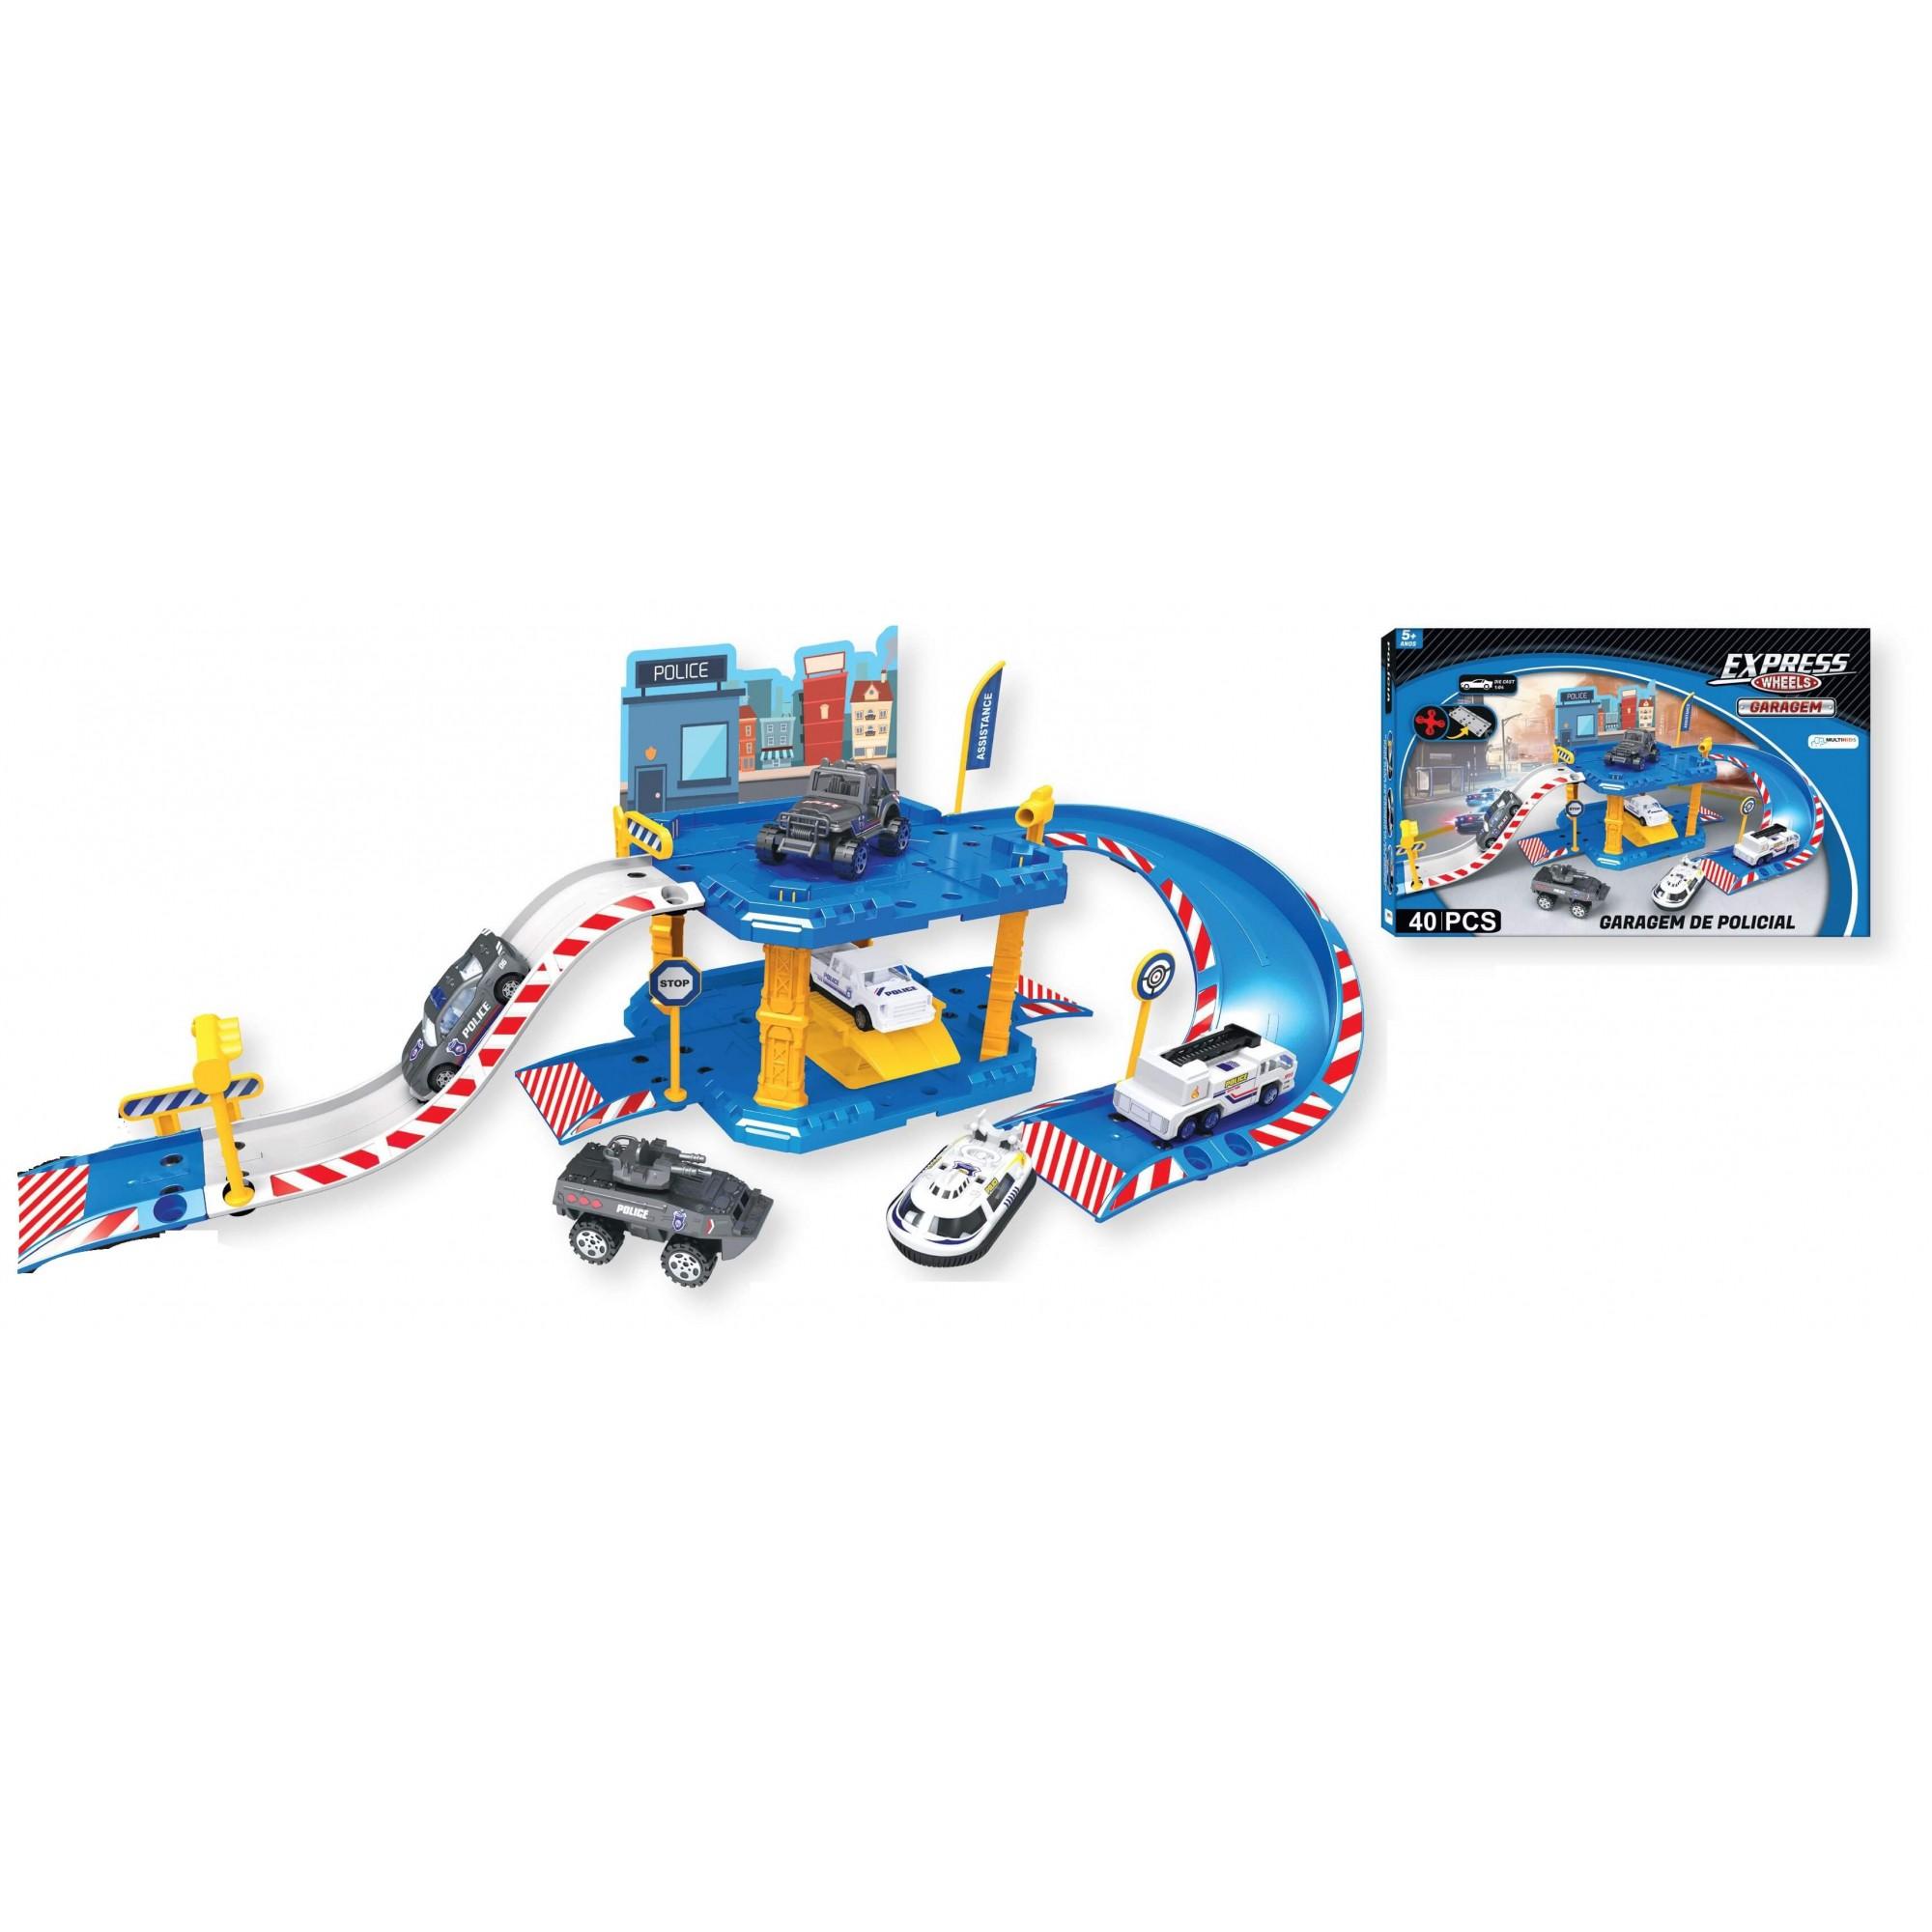 Express Wheels Garagem De Policial 40 Peças BR1237 Multilaser